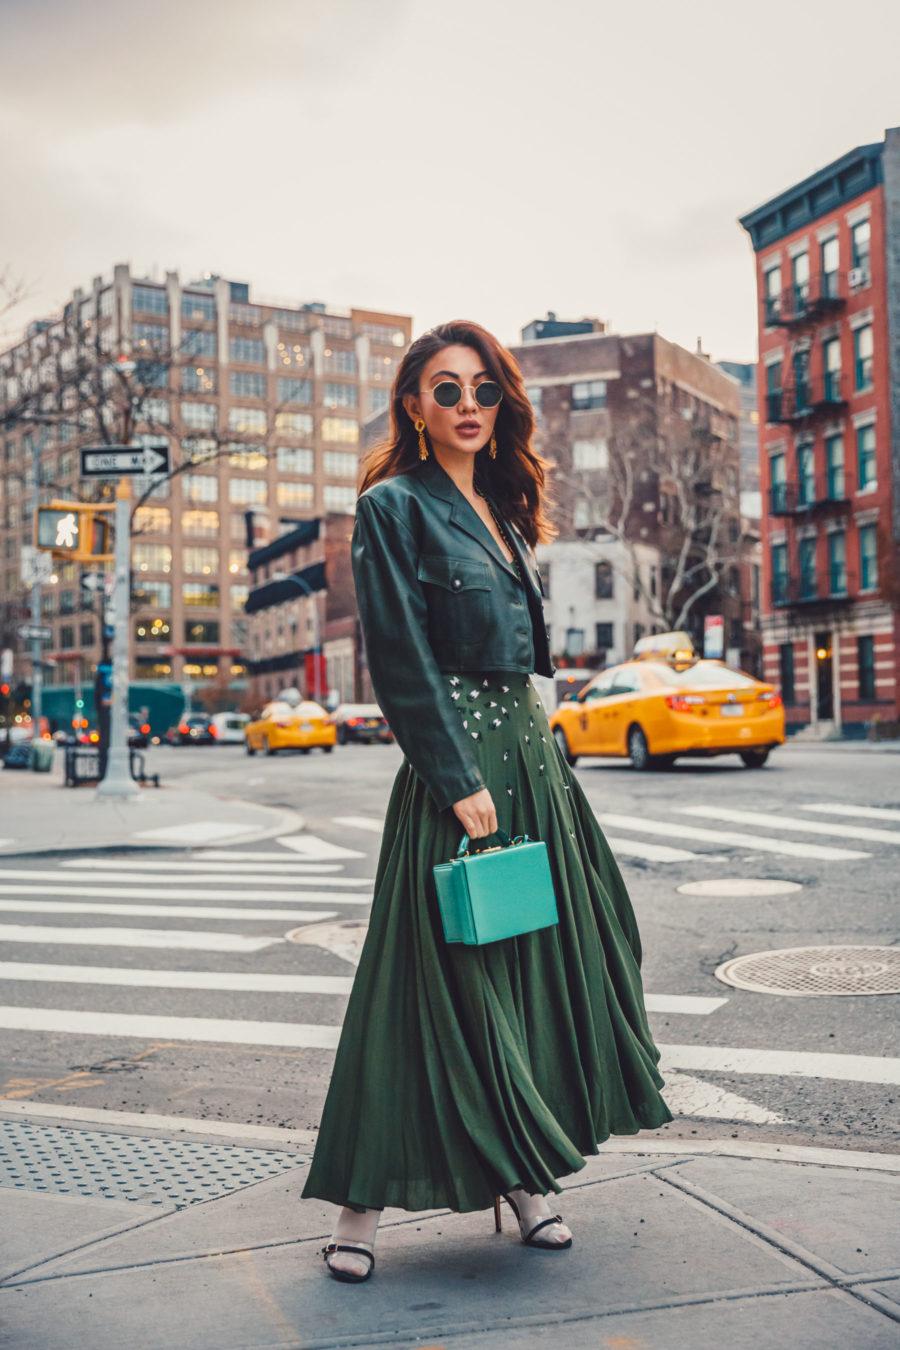 Jessica Wang NYFW Street Style // Notjessfashion.com